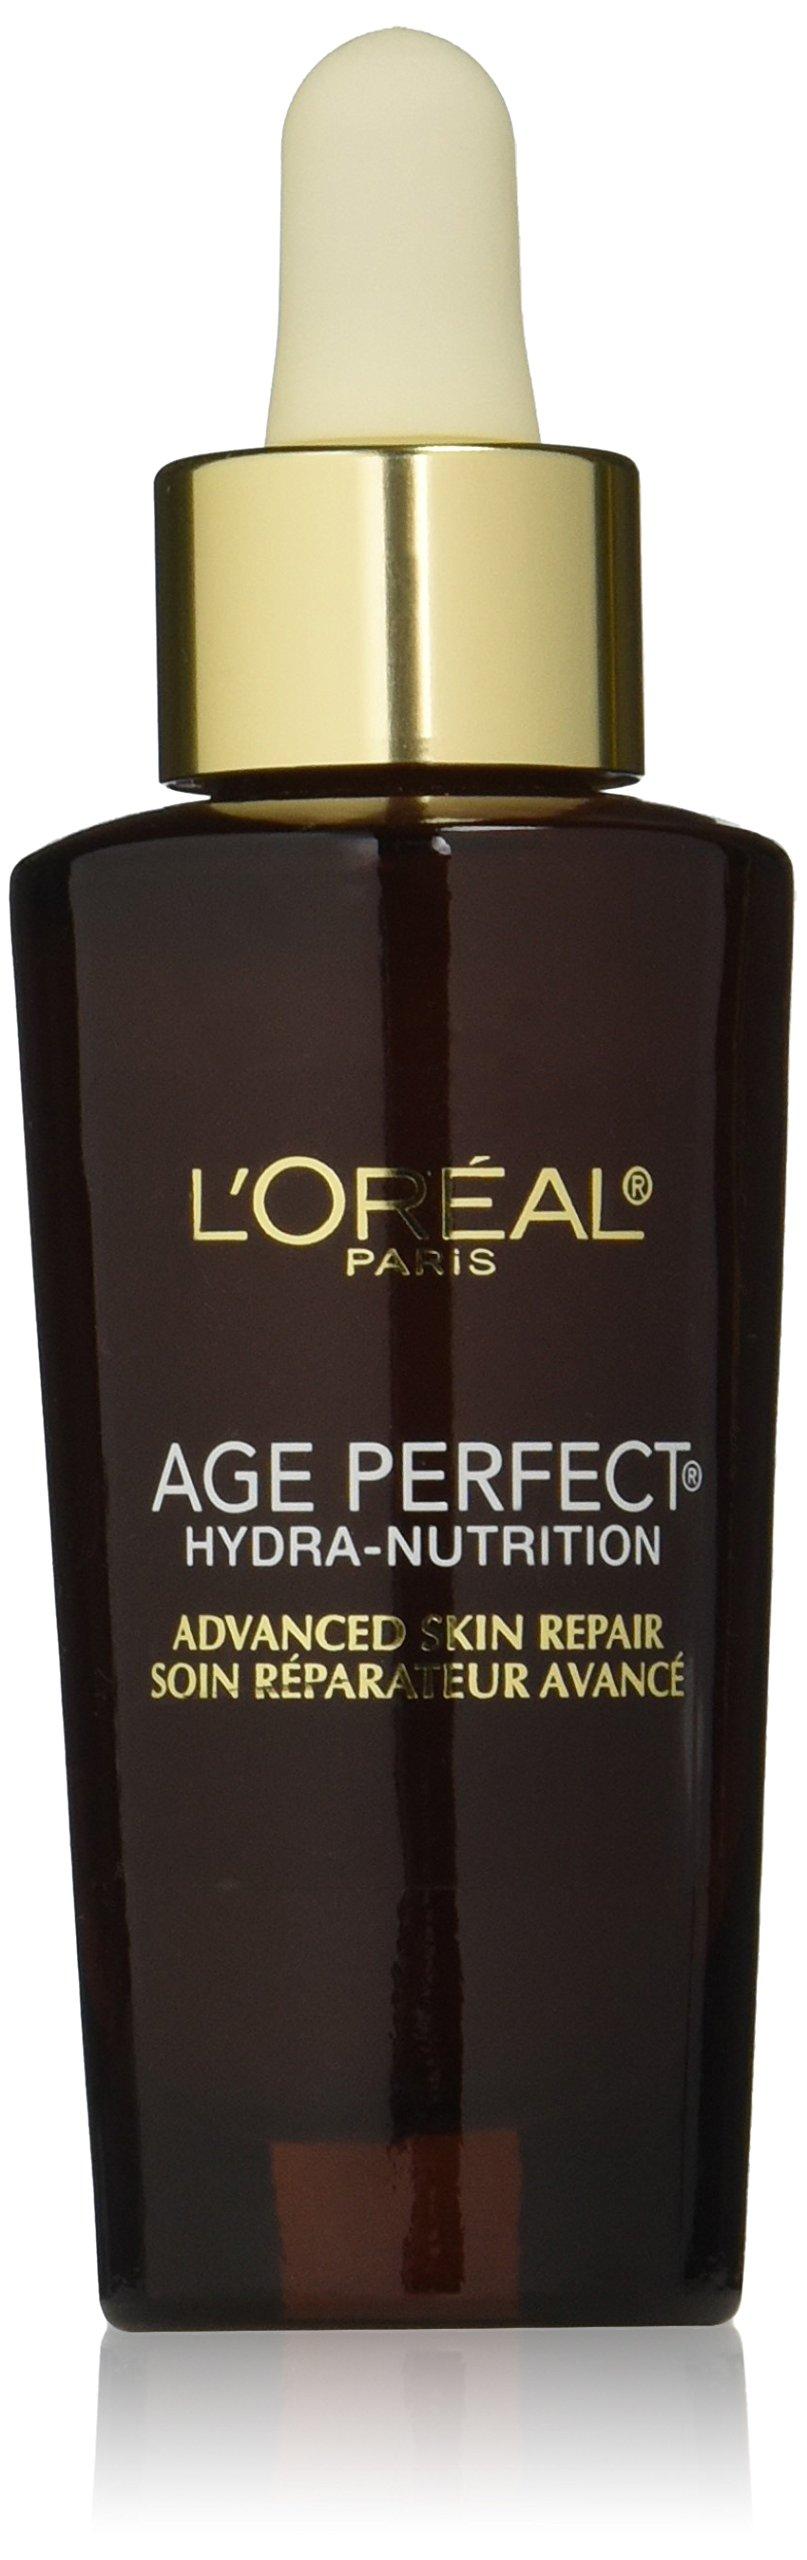 L'Oréal Paris Age Perfect Hydra Nutrition Daily Repair Face Serum, 1 oz.